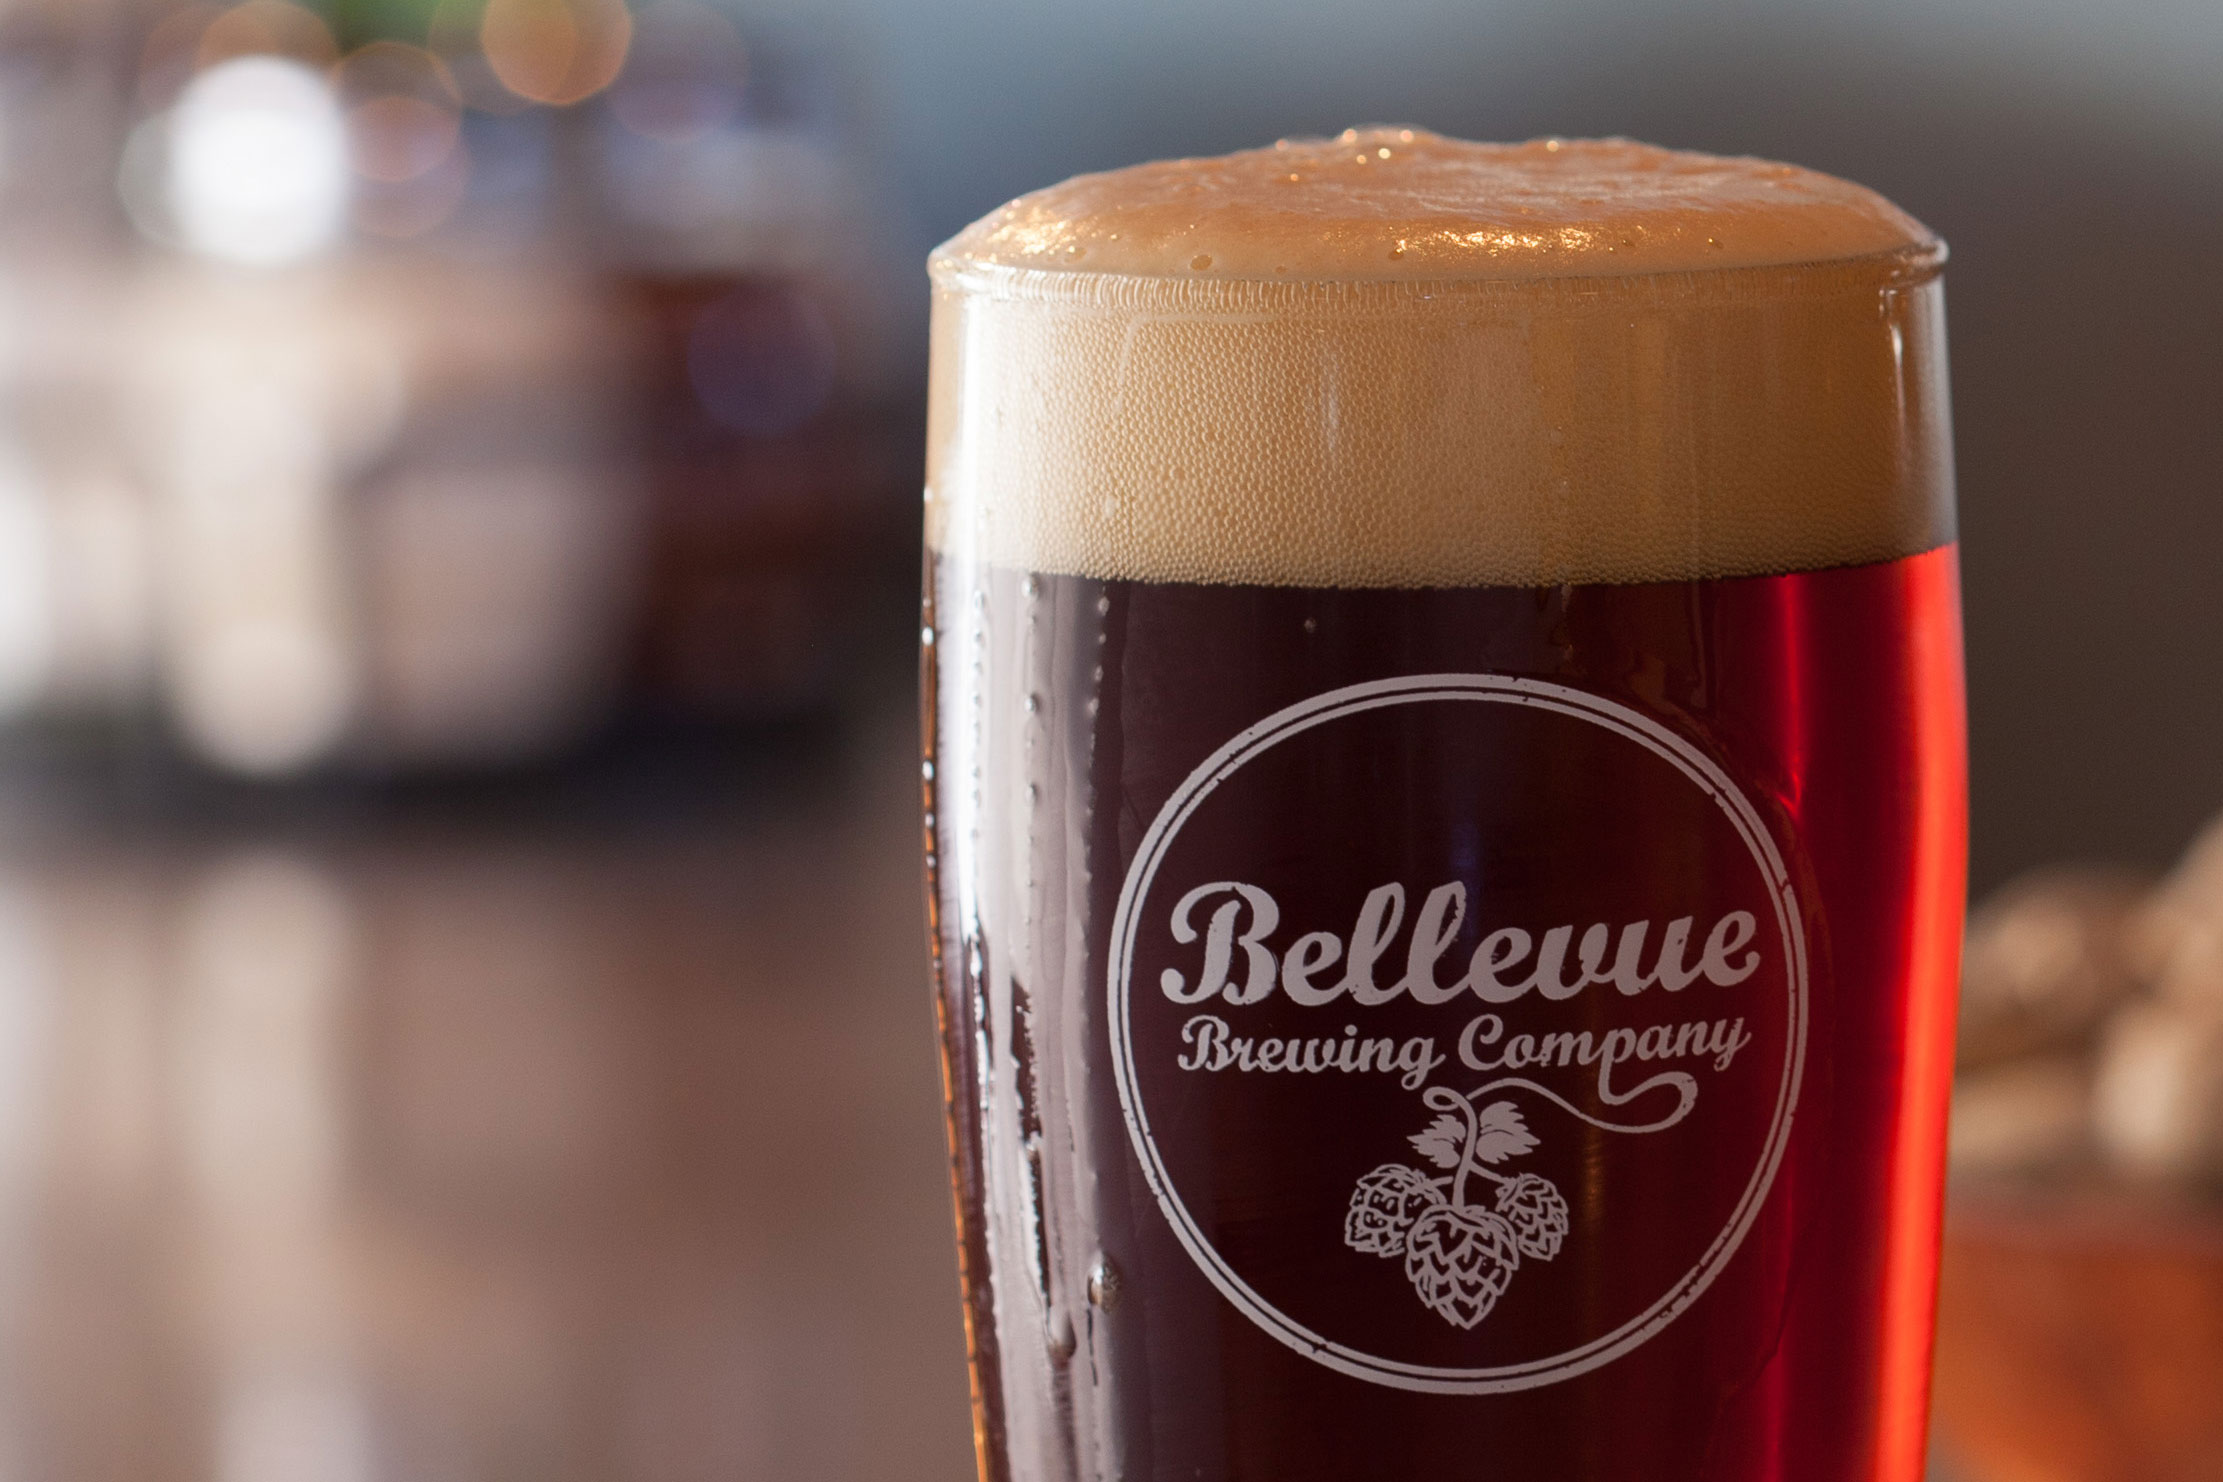 Bellevue-Brewing-Company-scotch-ale.jpg